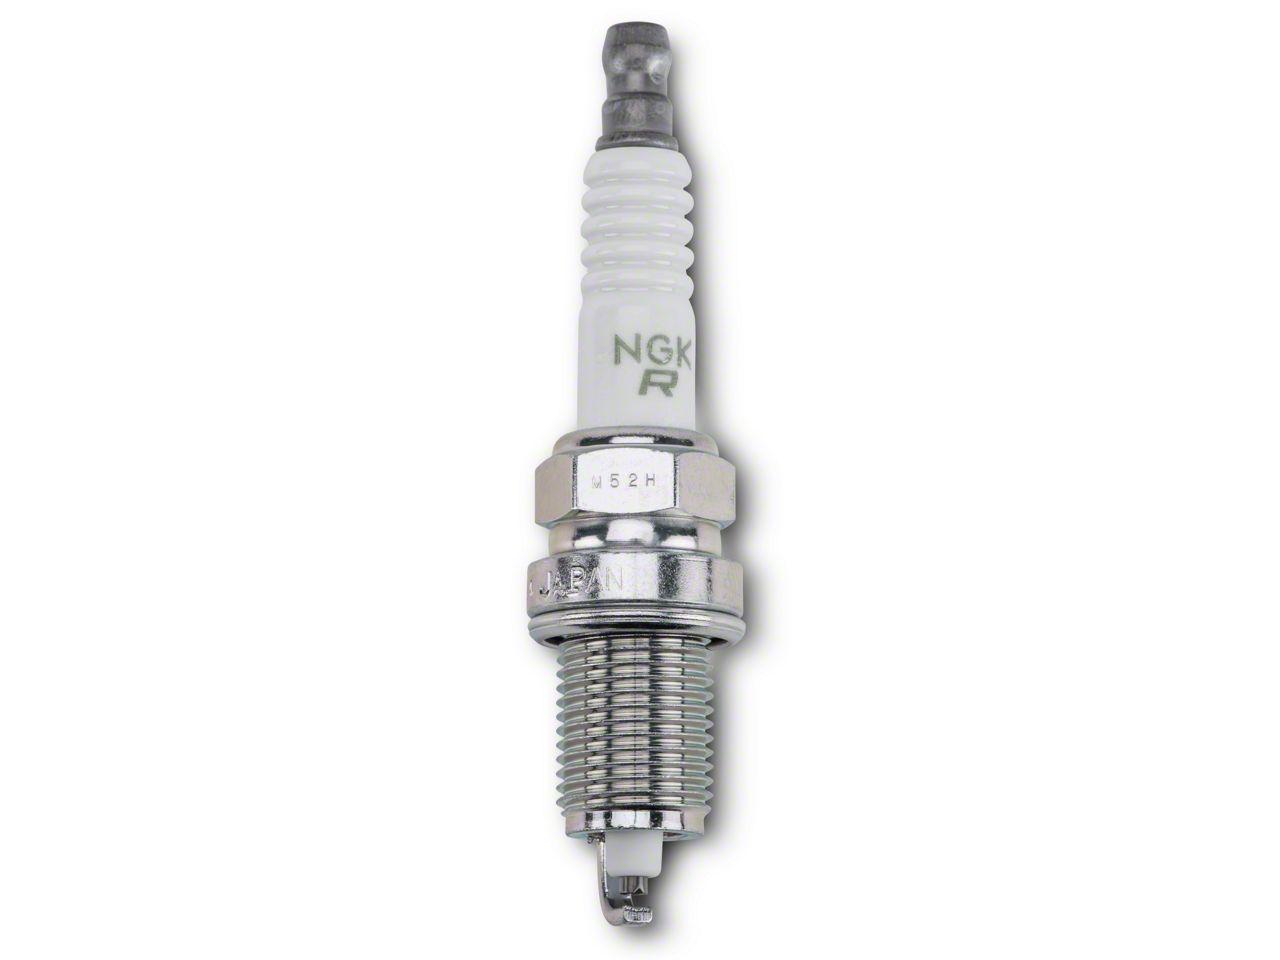 NGK V-Power Spark Plug (87-90 4.2L Jeep Wrangler YJ)